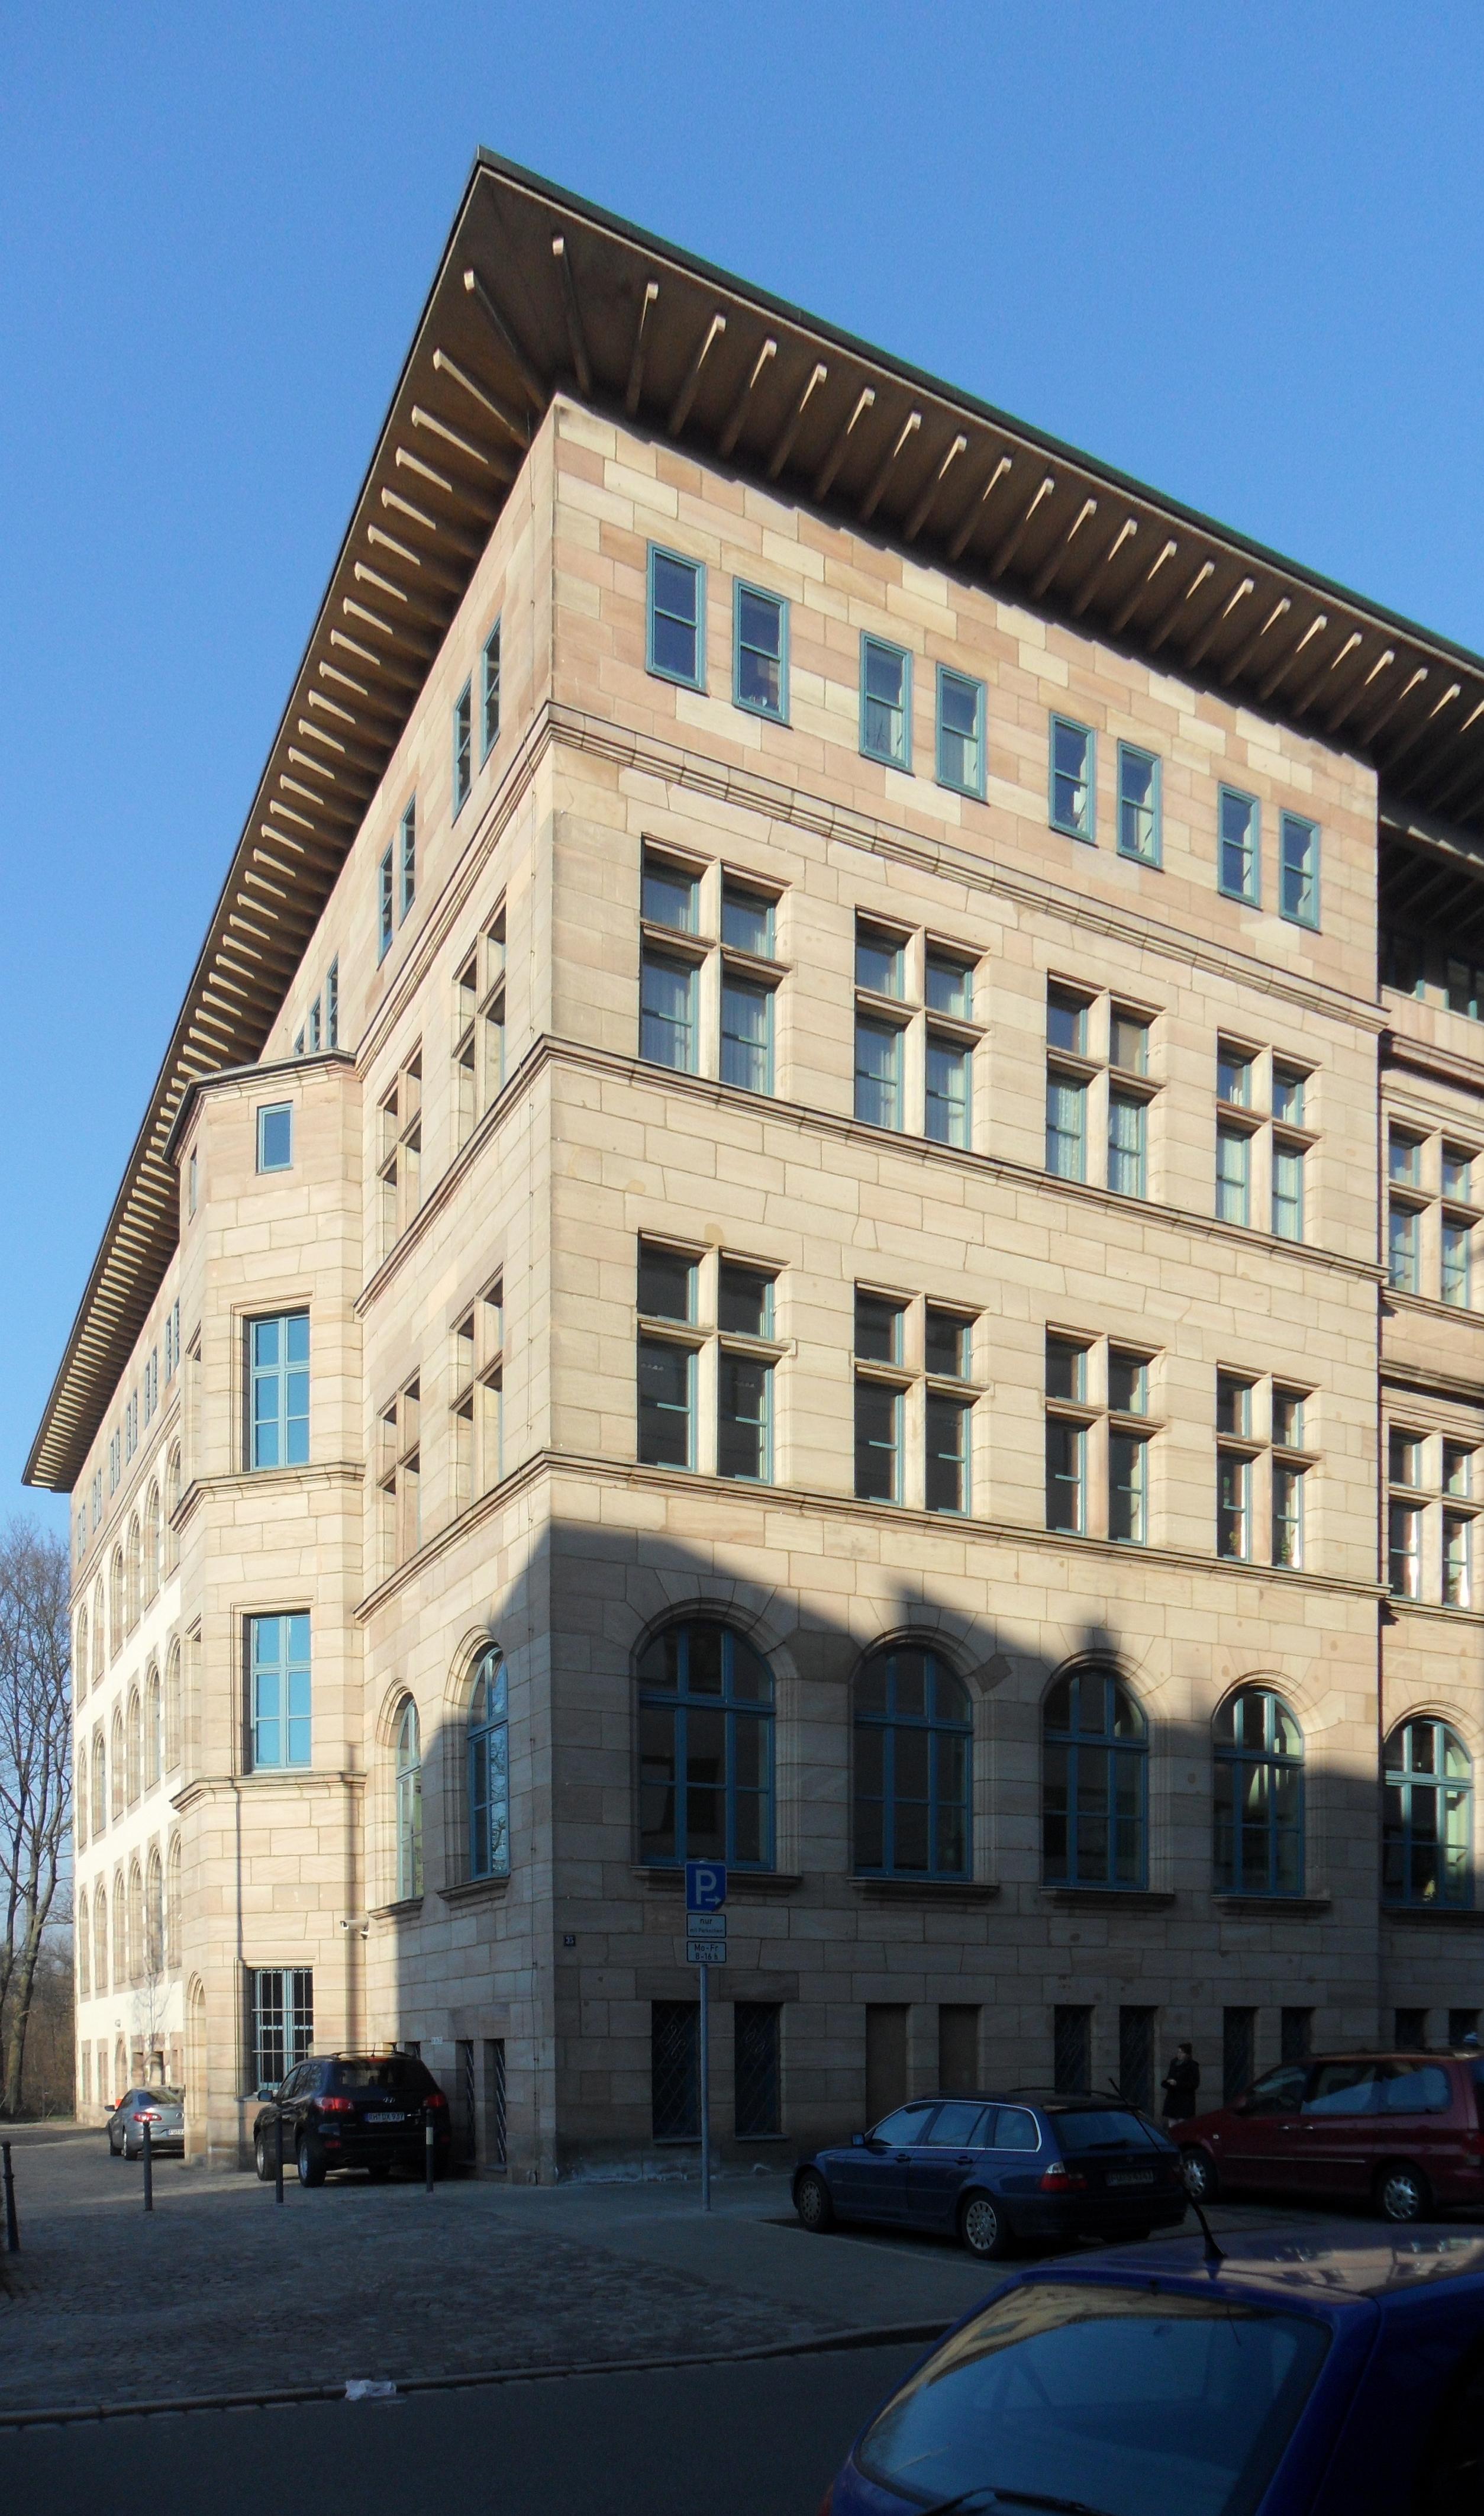 Amtsgericht Nürnberg Flaschenhofstr file amtsgericht nürnberg flaschenhofstraße 35 marienvorstadt 09 jpg